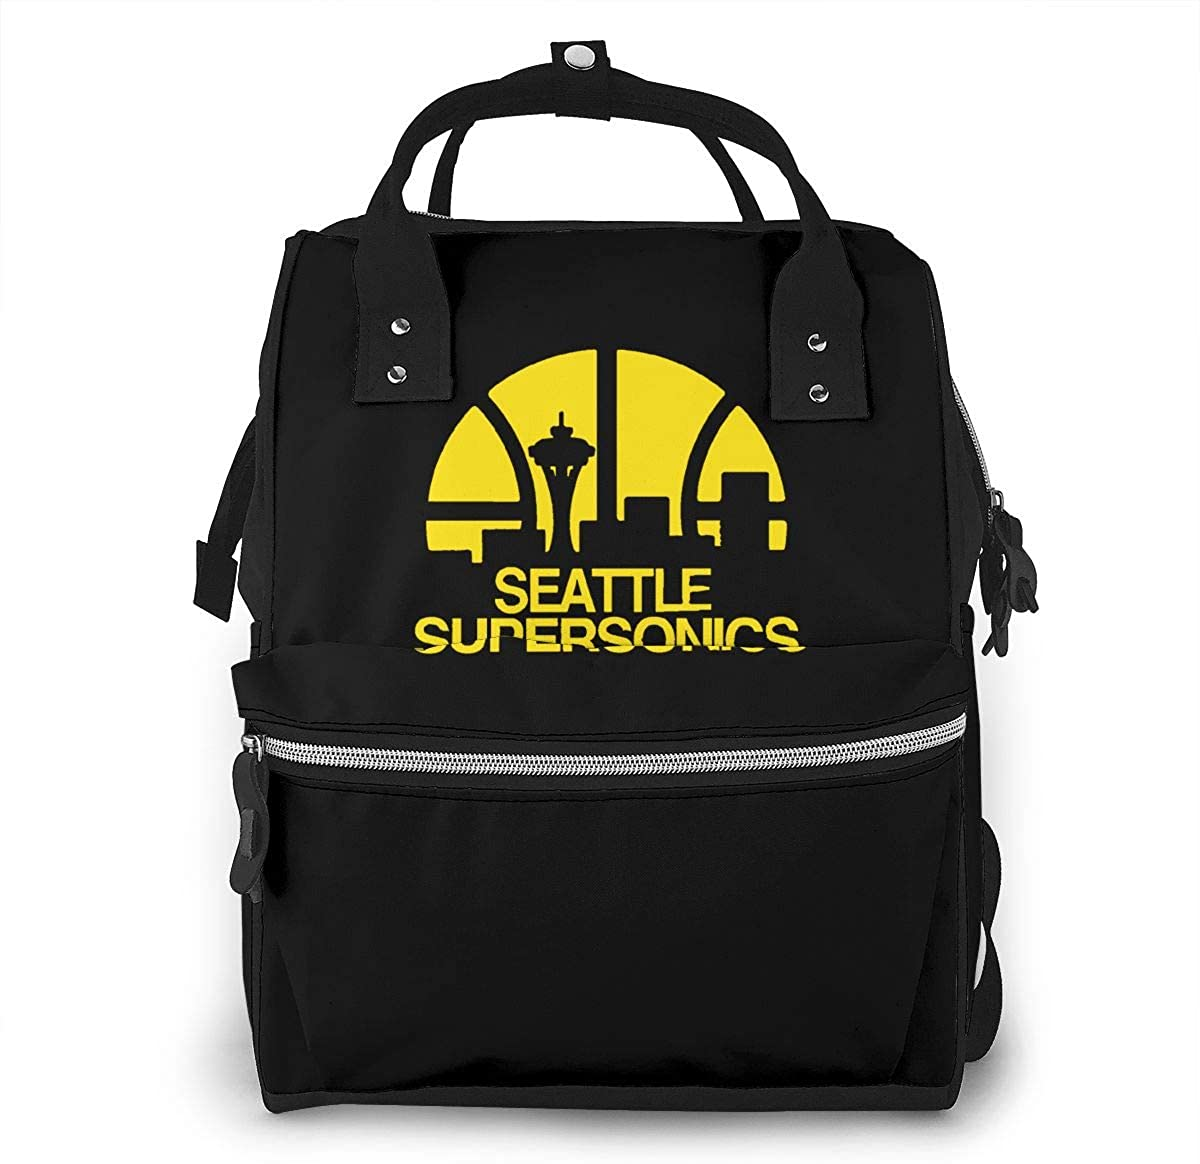 Seattle Supersonics Multi-functional Mummy Bag Diaper Bag Bookbag Backpack Portable For Family Travel